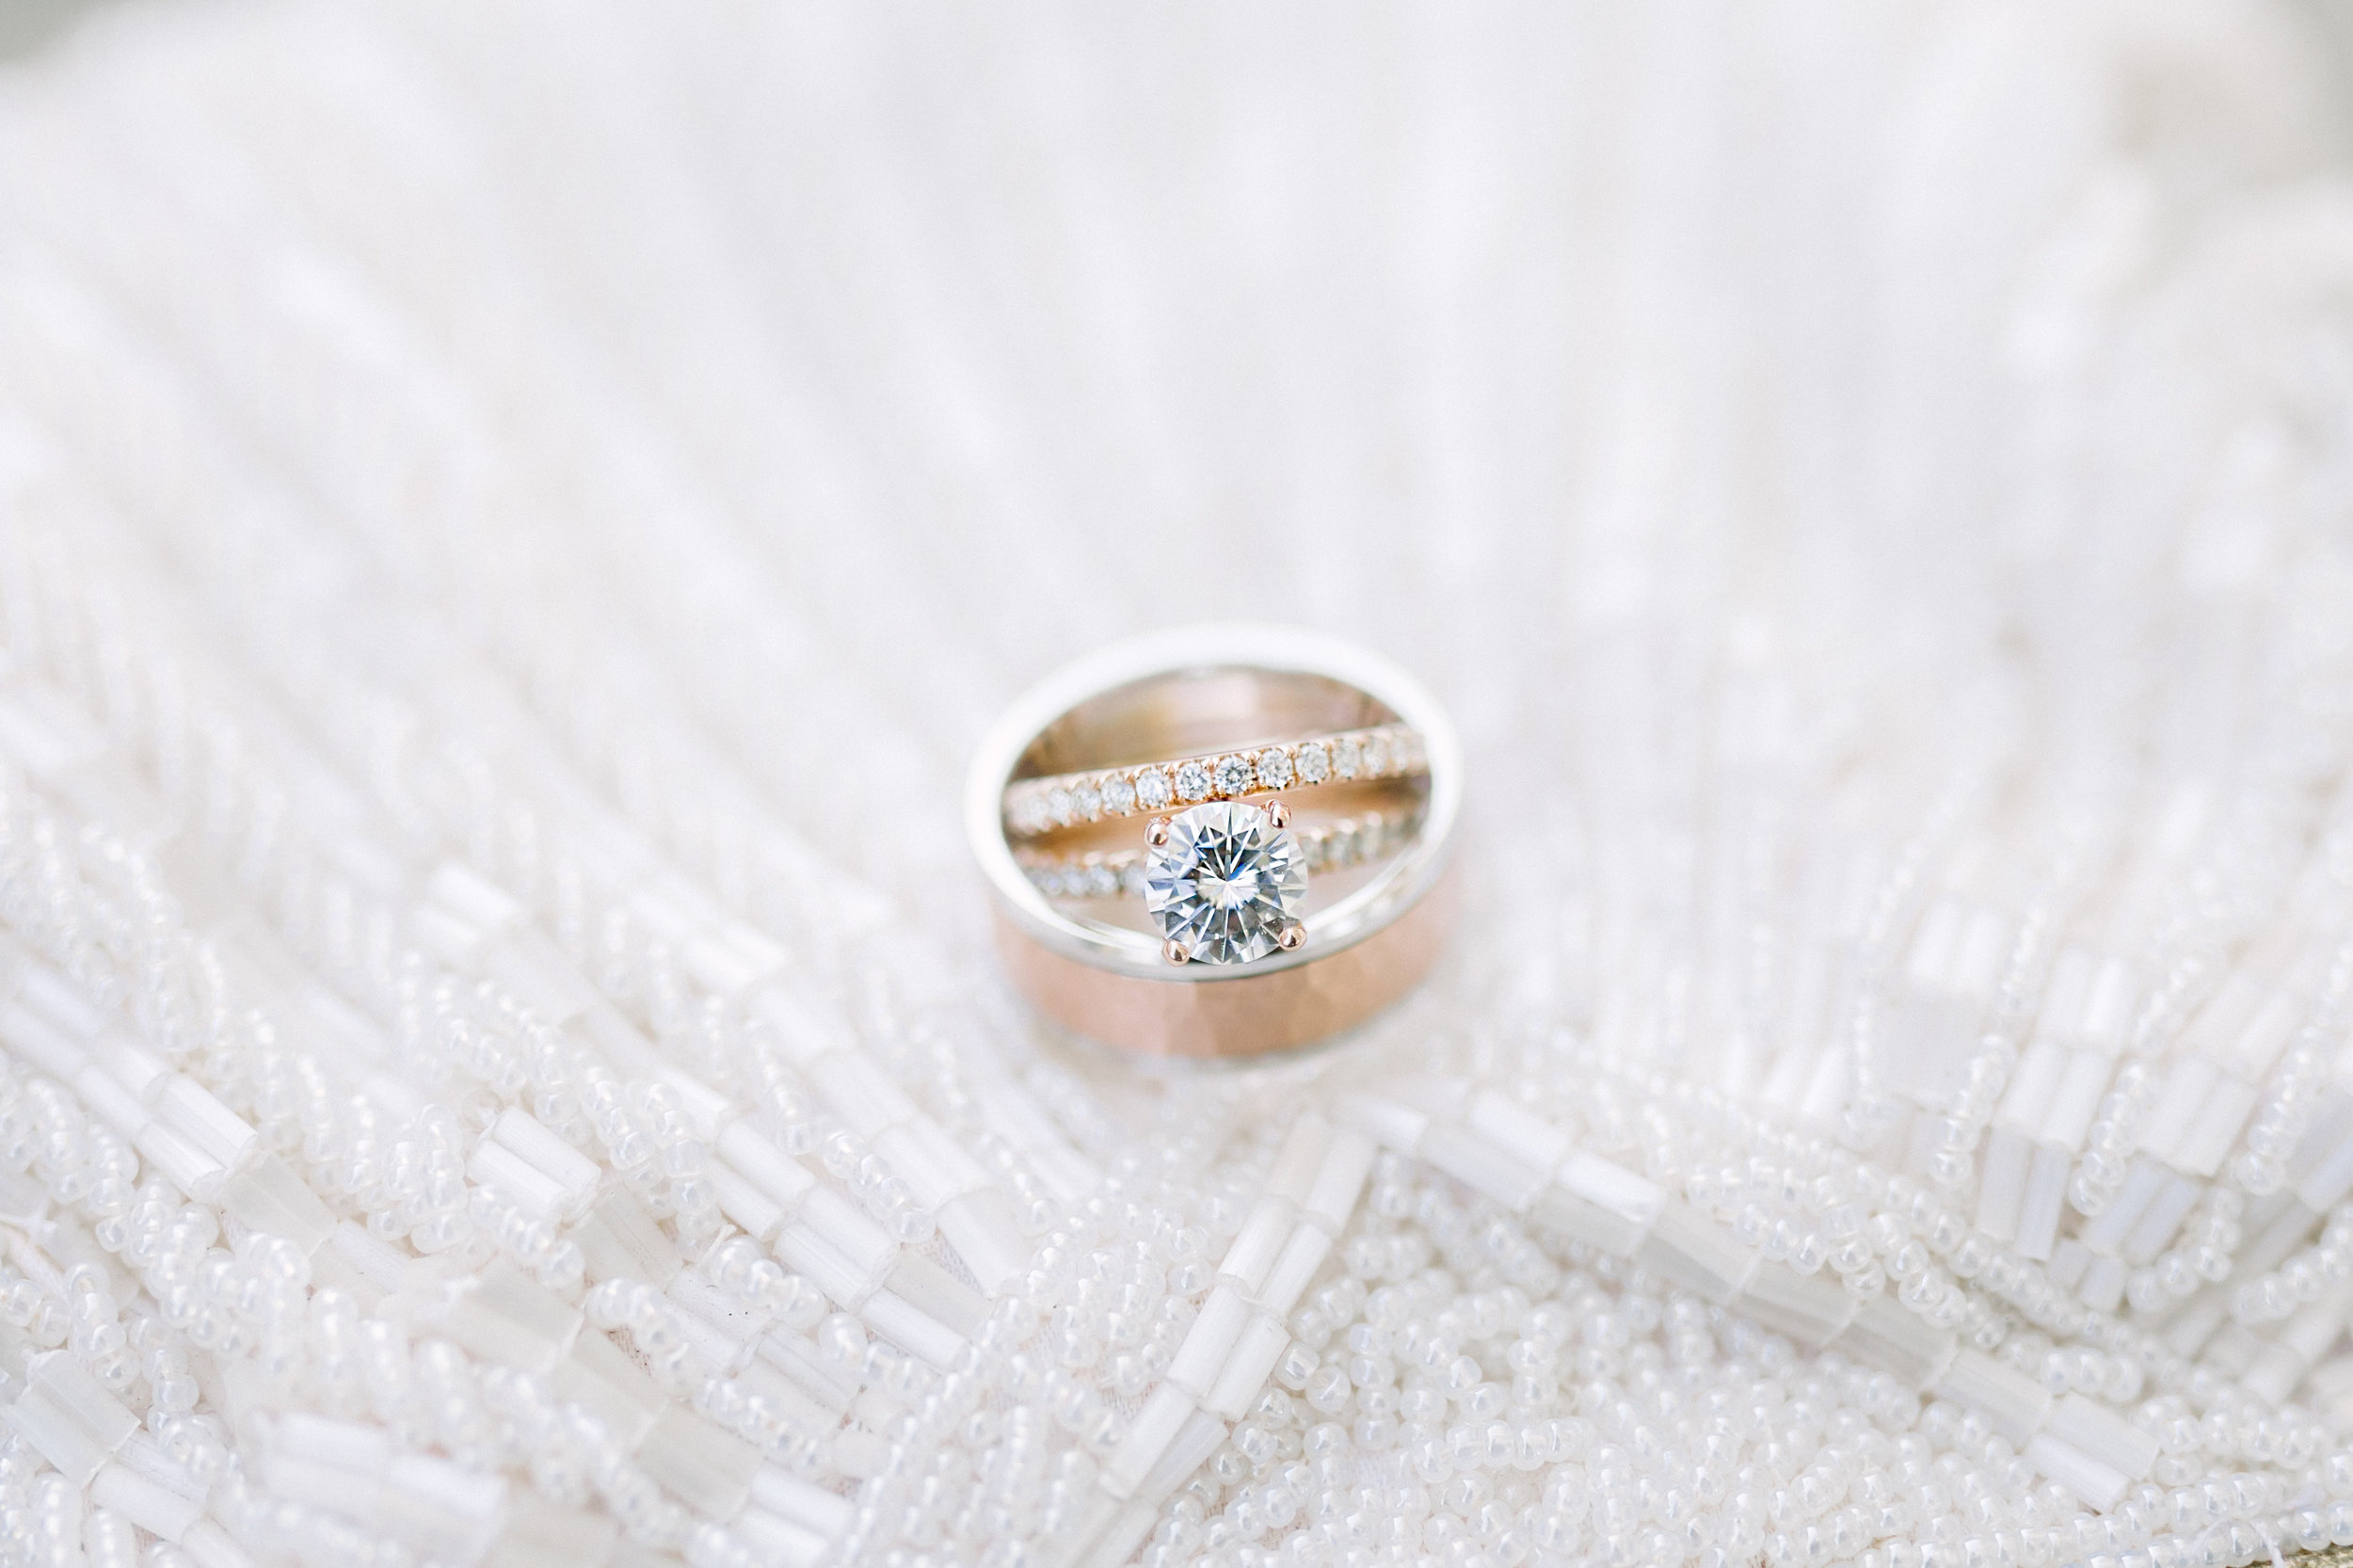 Elegant wedding ring photos and wedding details